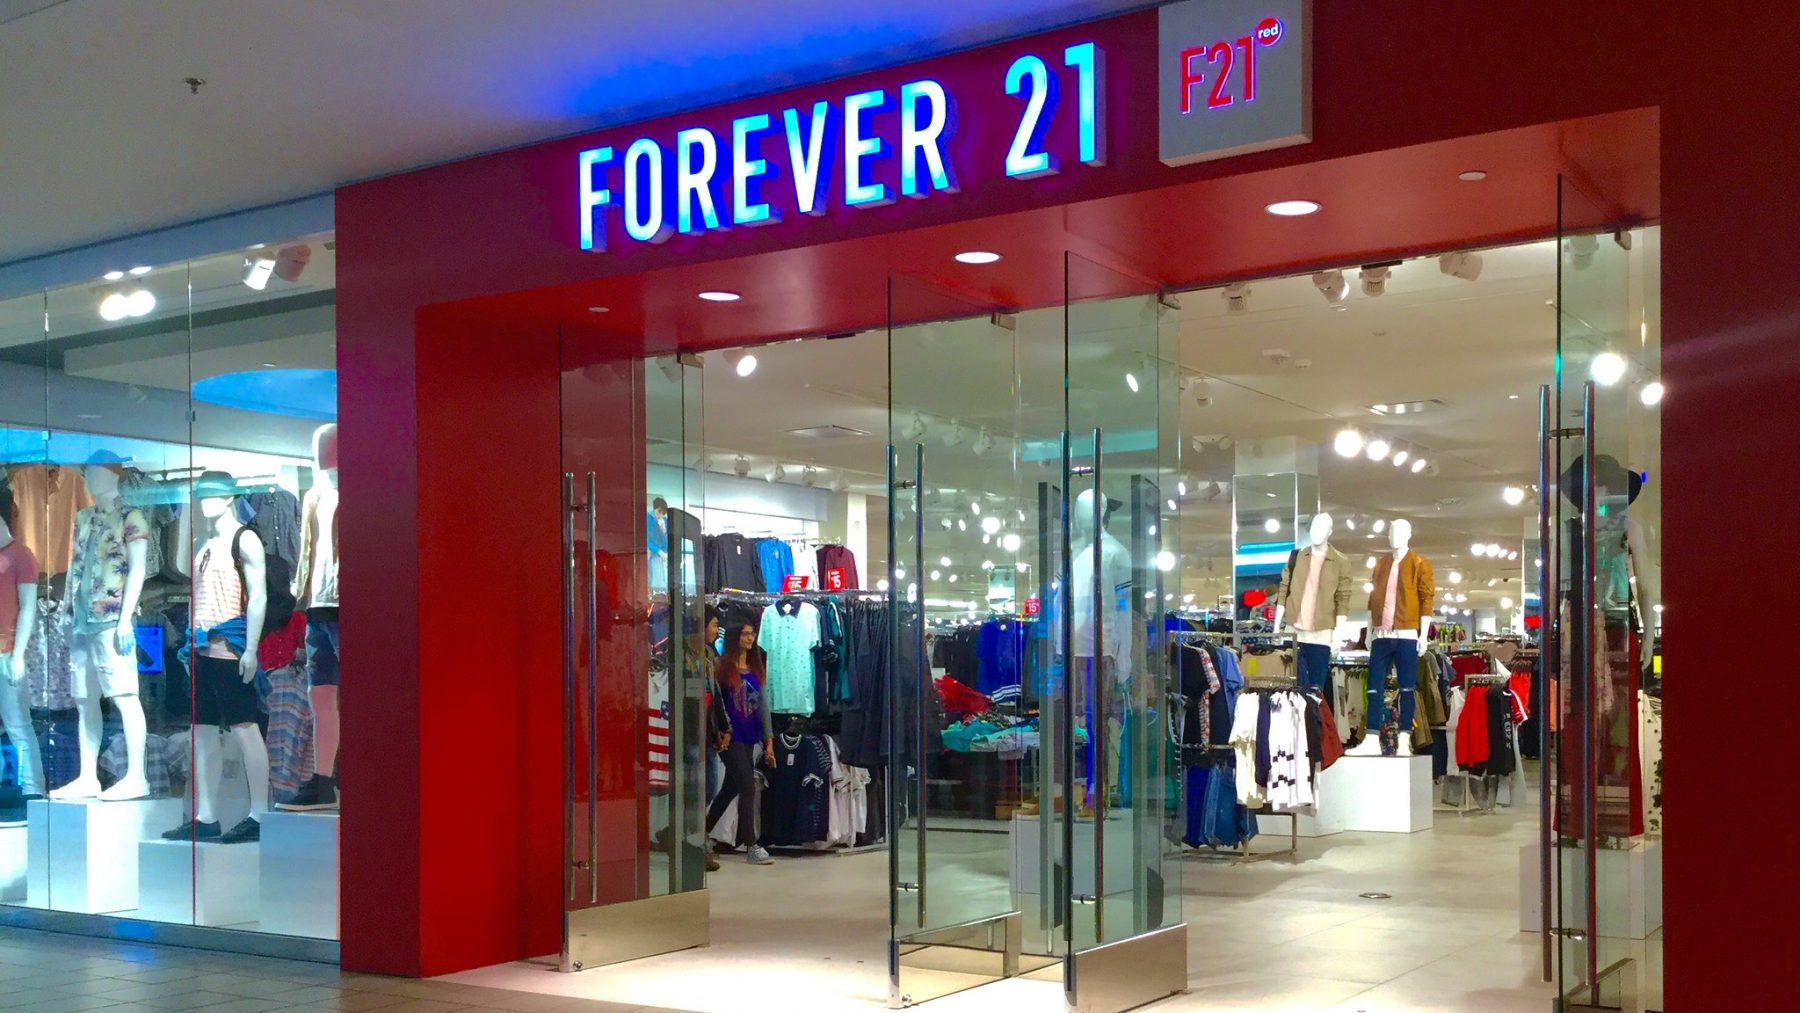 Forever 21 flickr